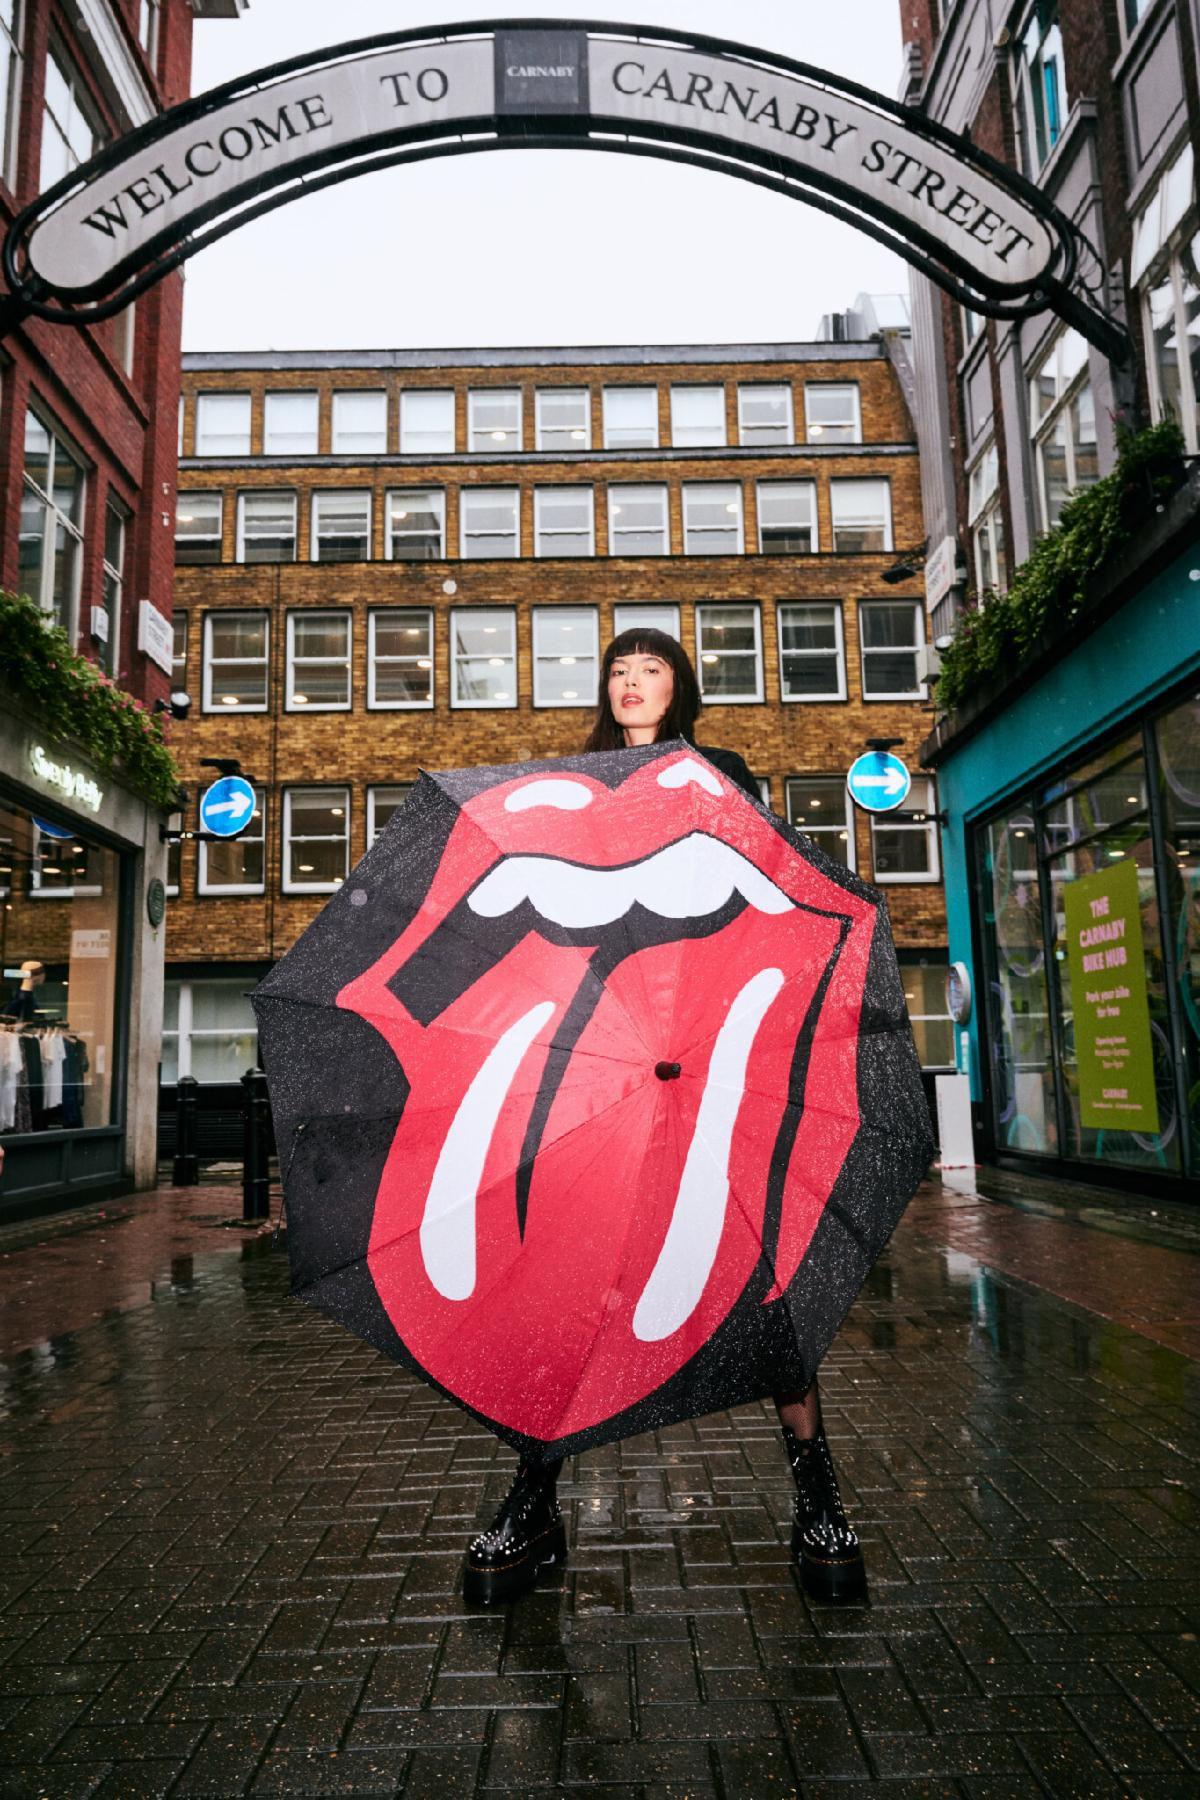 Rolling Stones Exhibitionism Heading to New York